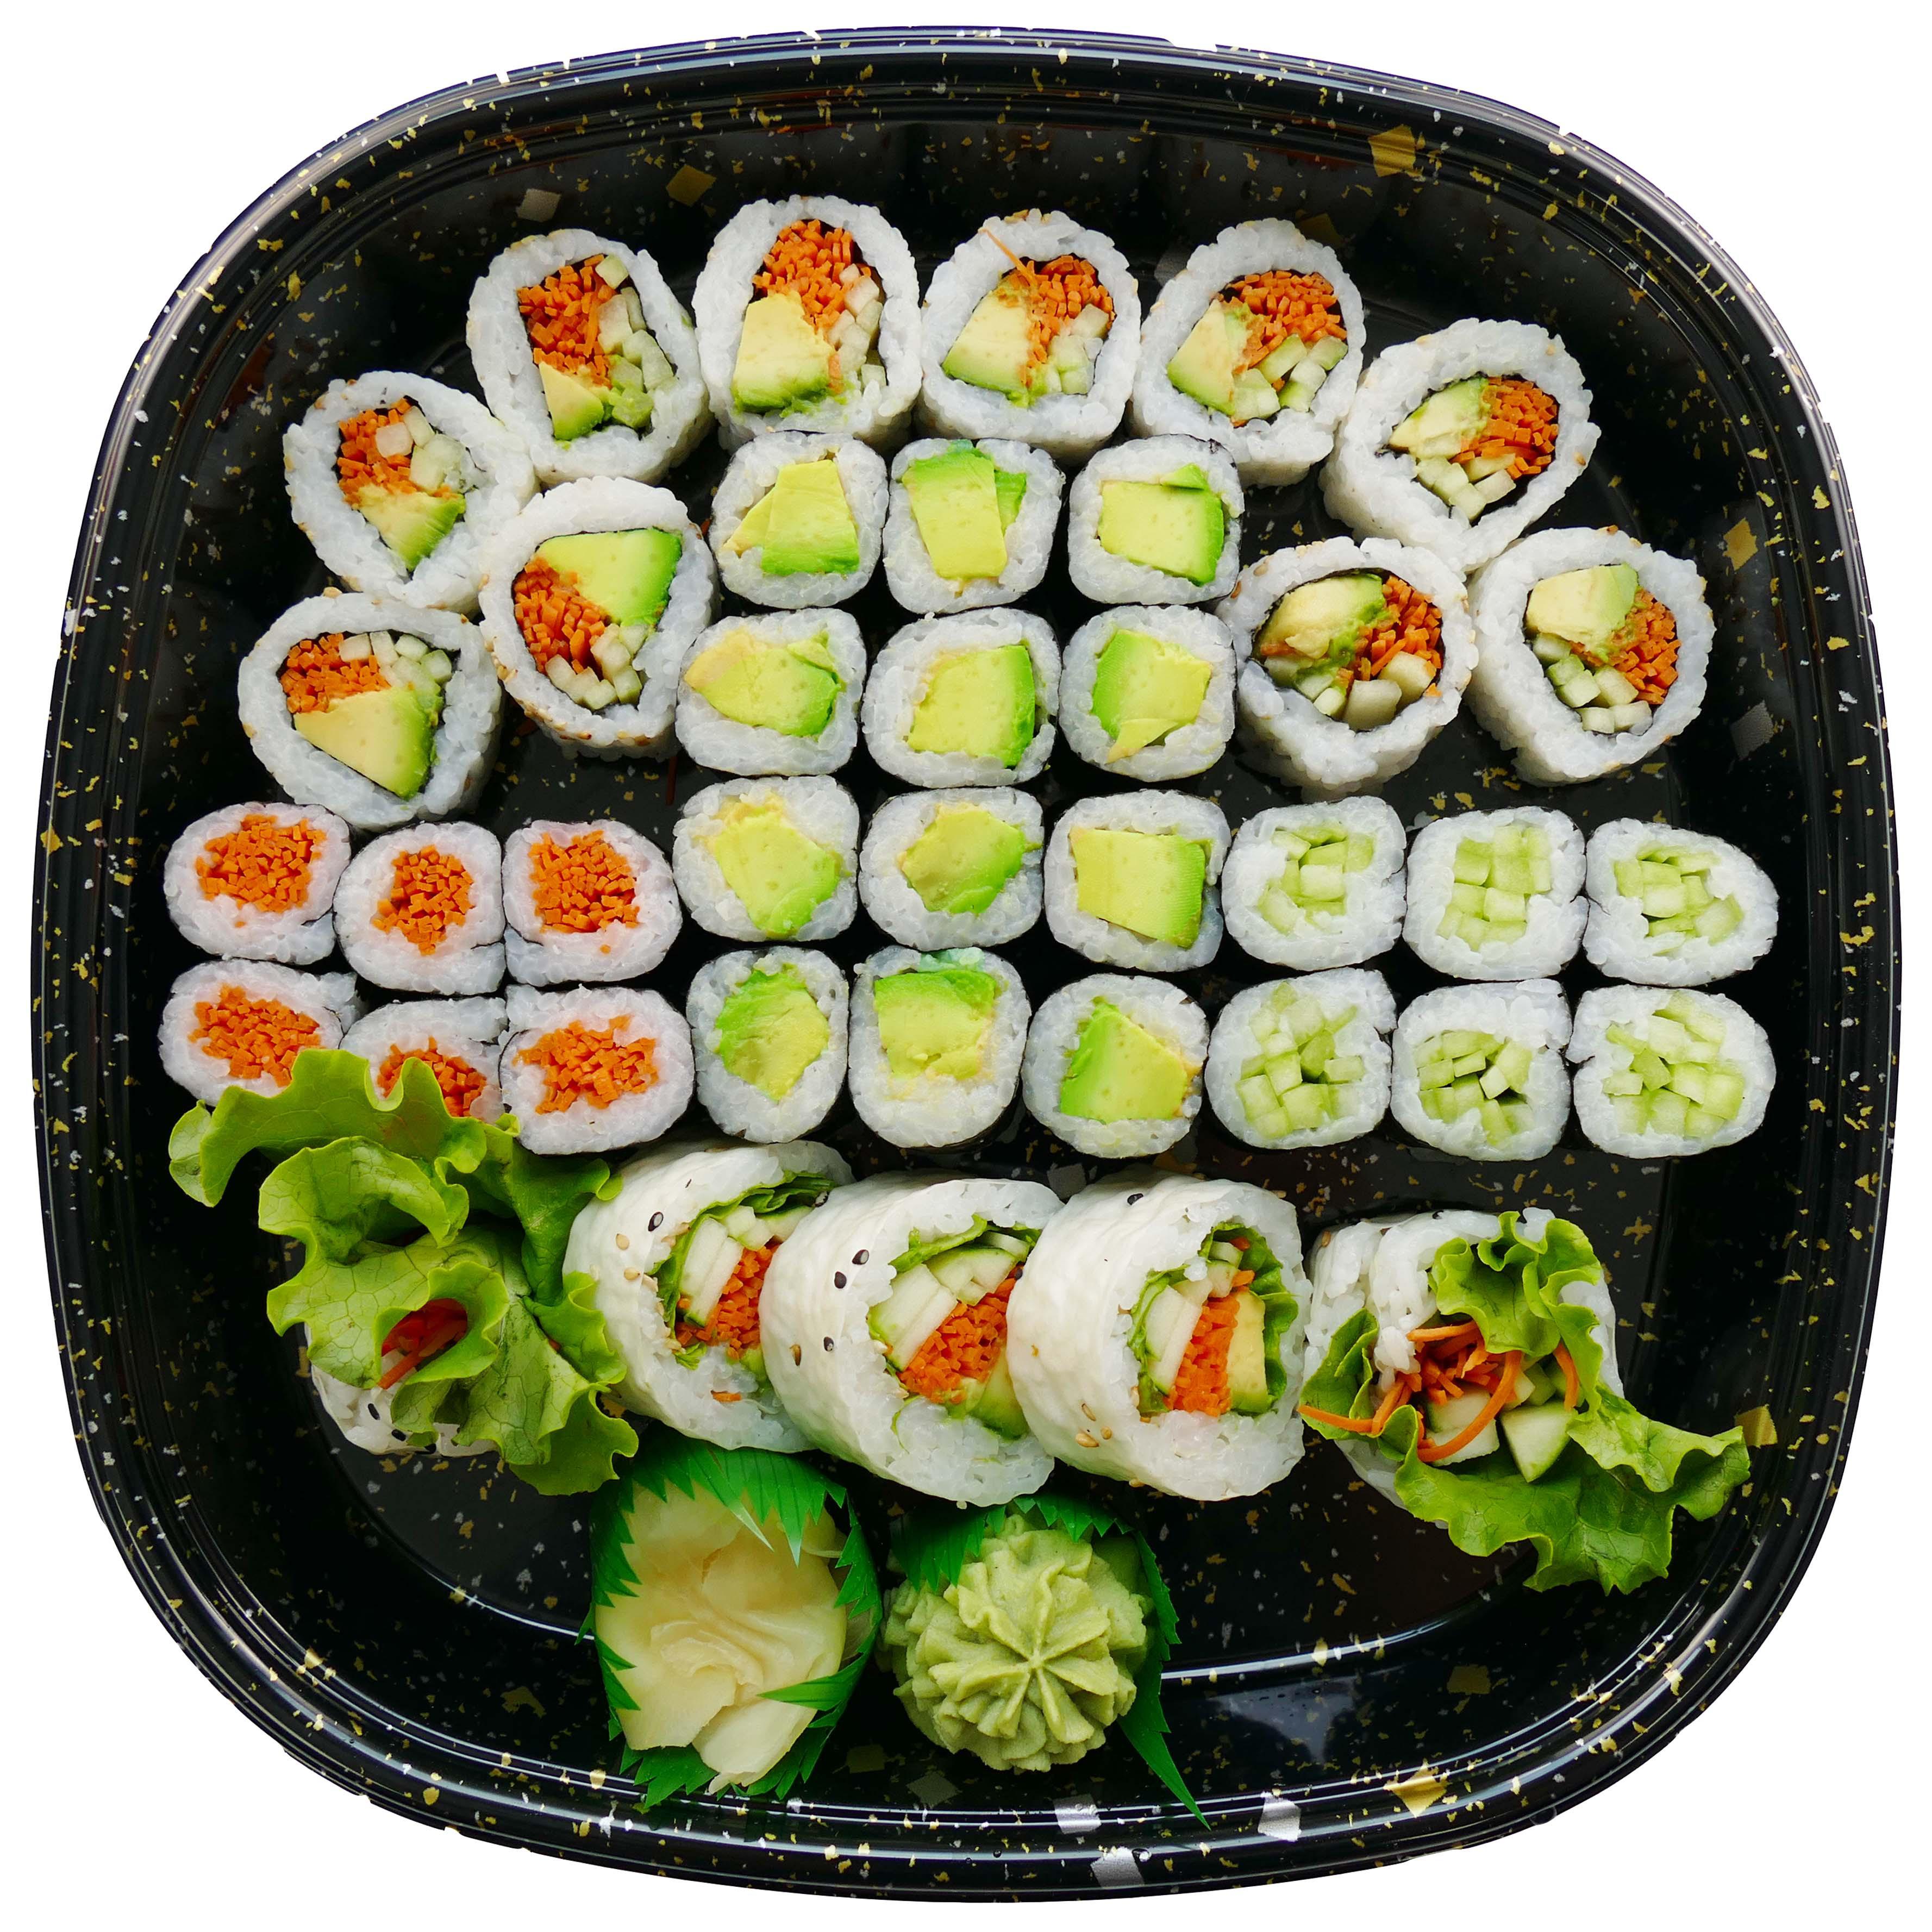 New! H‑E‑B Sushiya Vegetarian Party Tray